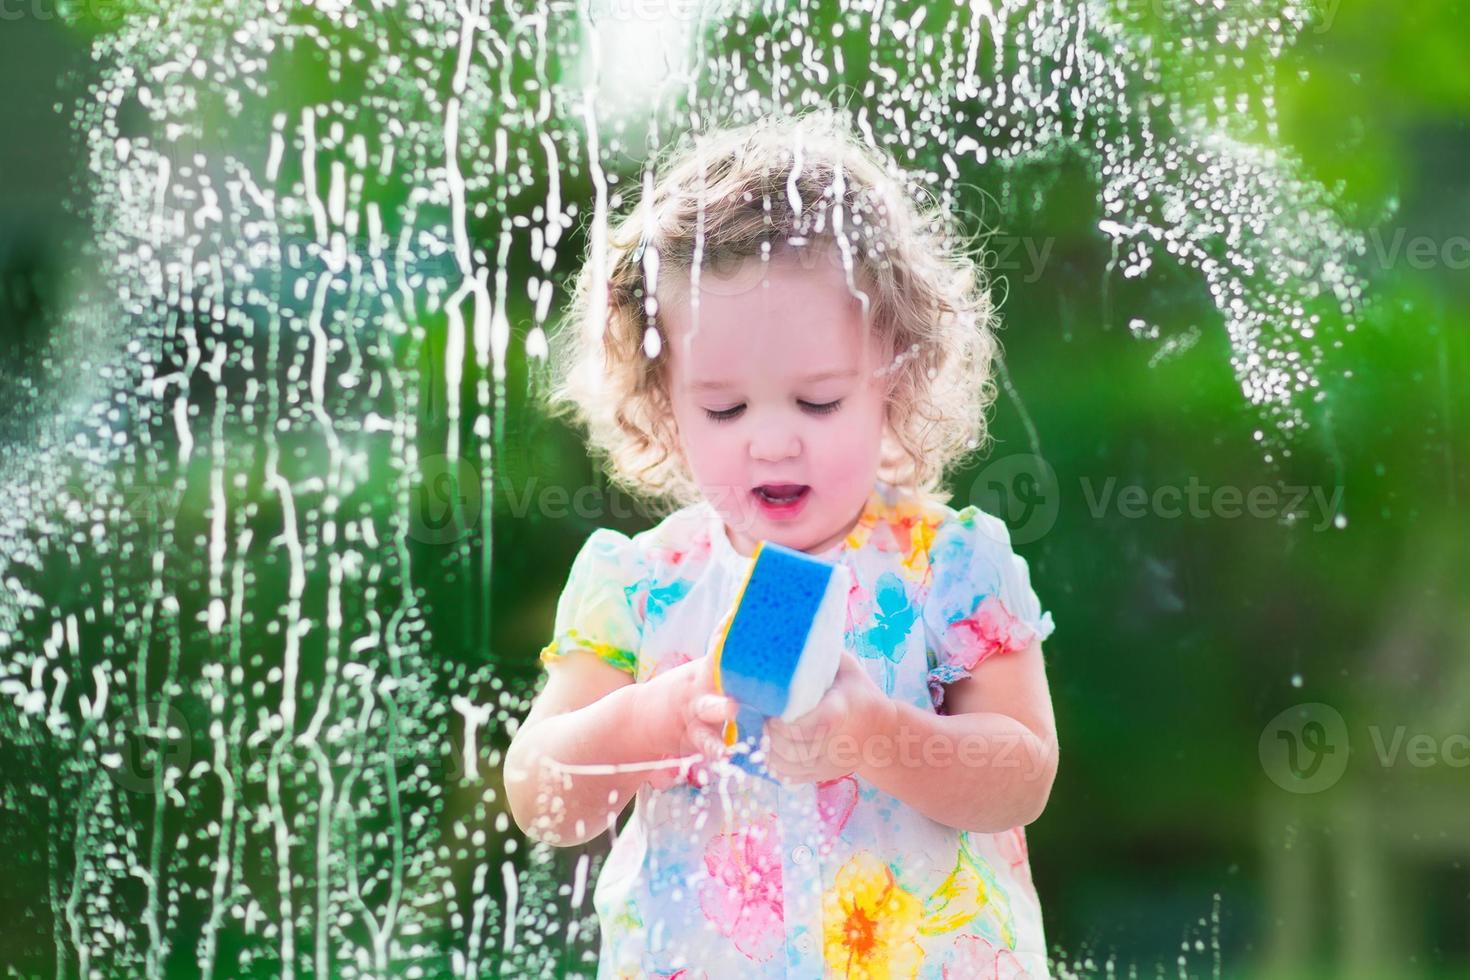 menina bonitinha lavando uma janela foto